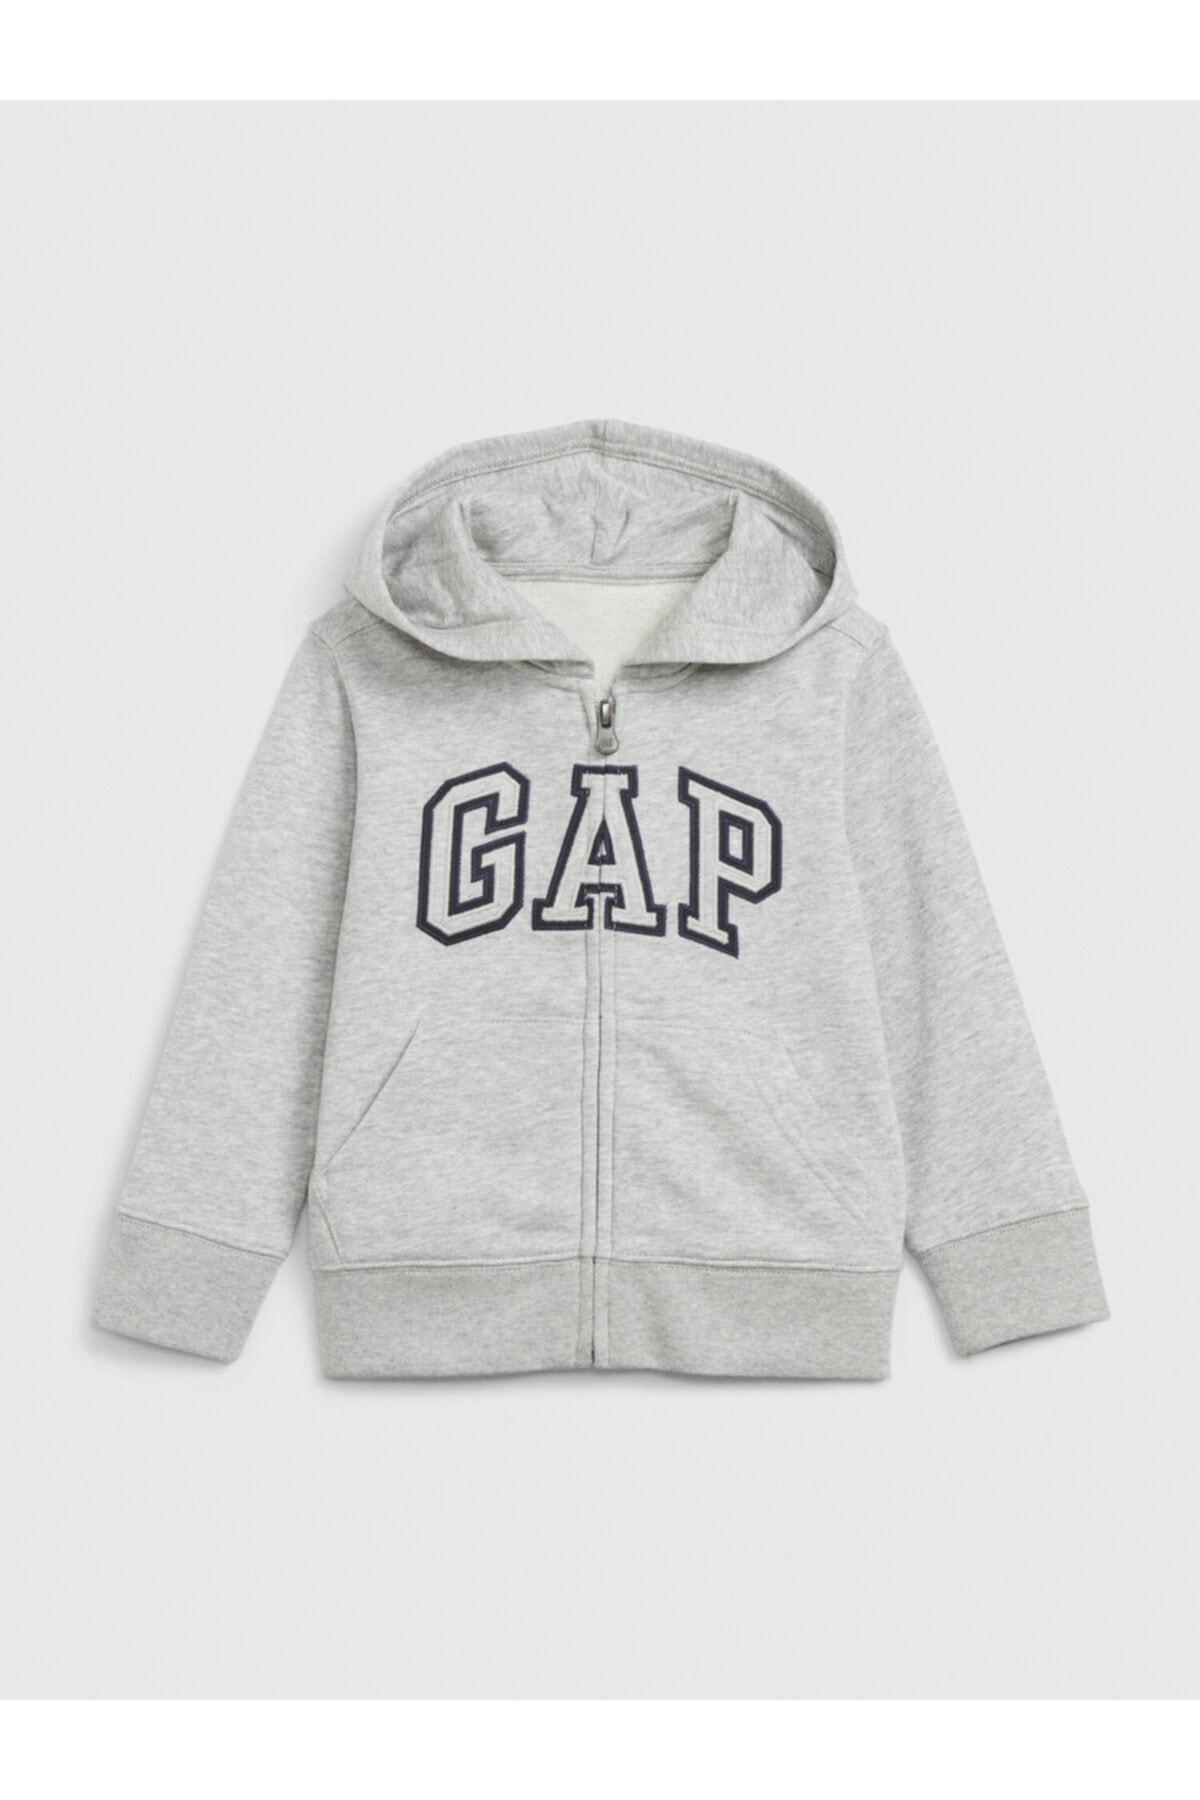 GAP Logo Kapüşonlu Sweatshirt 1